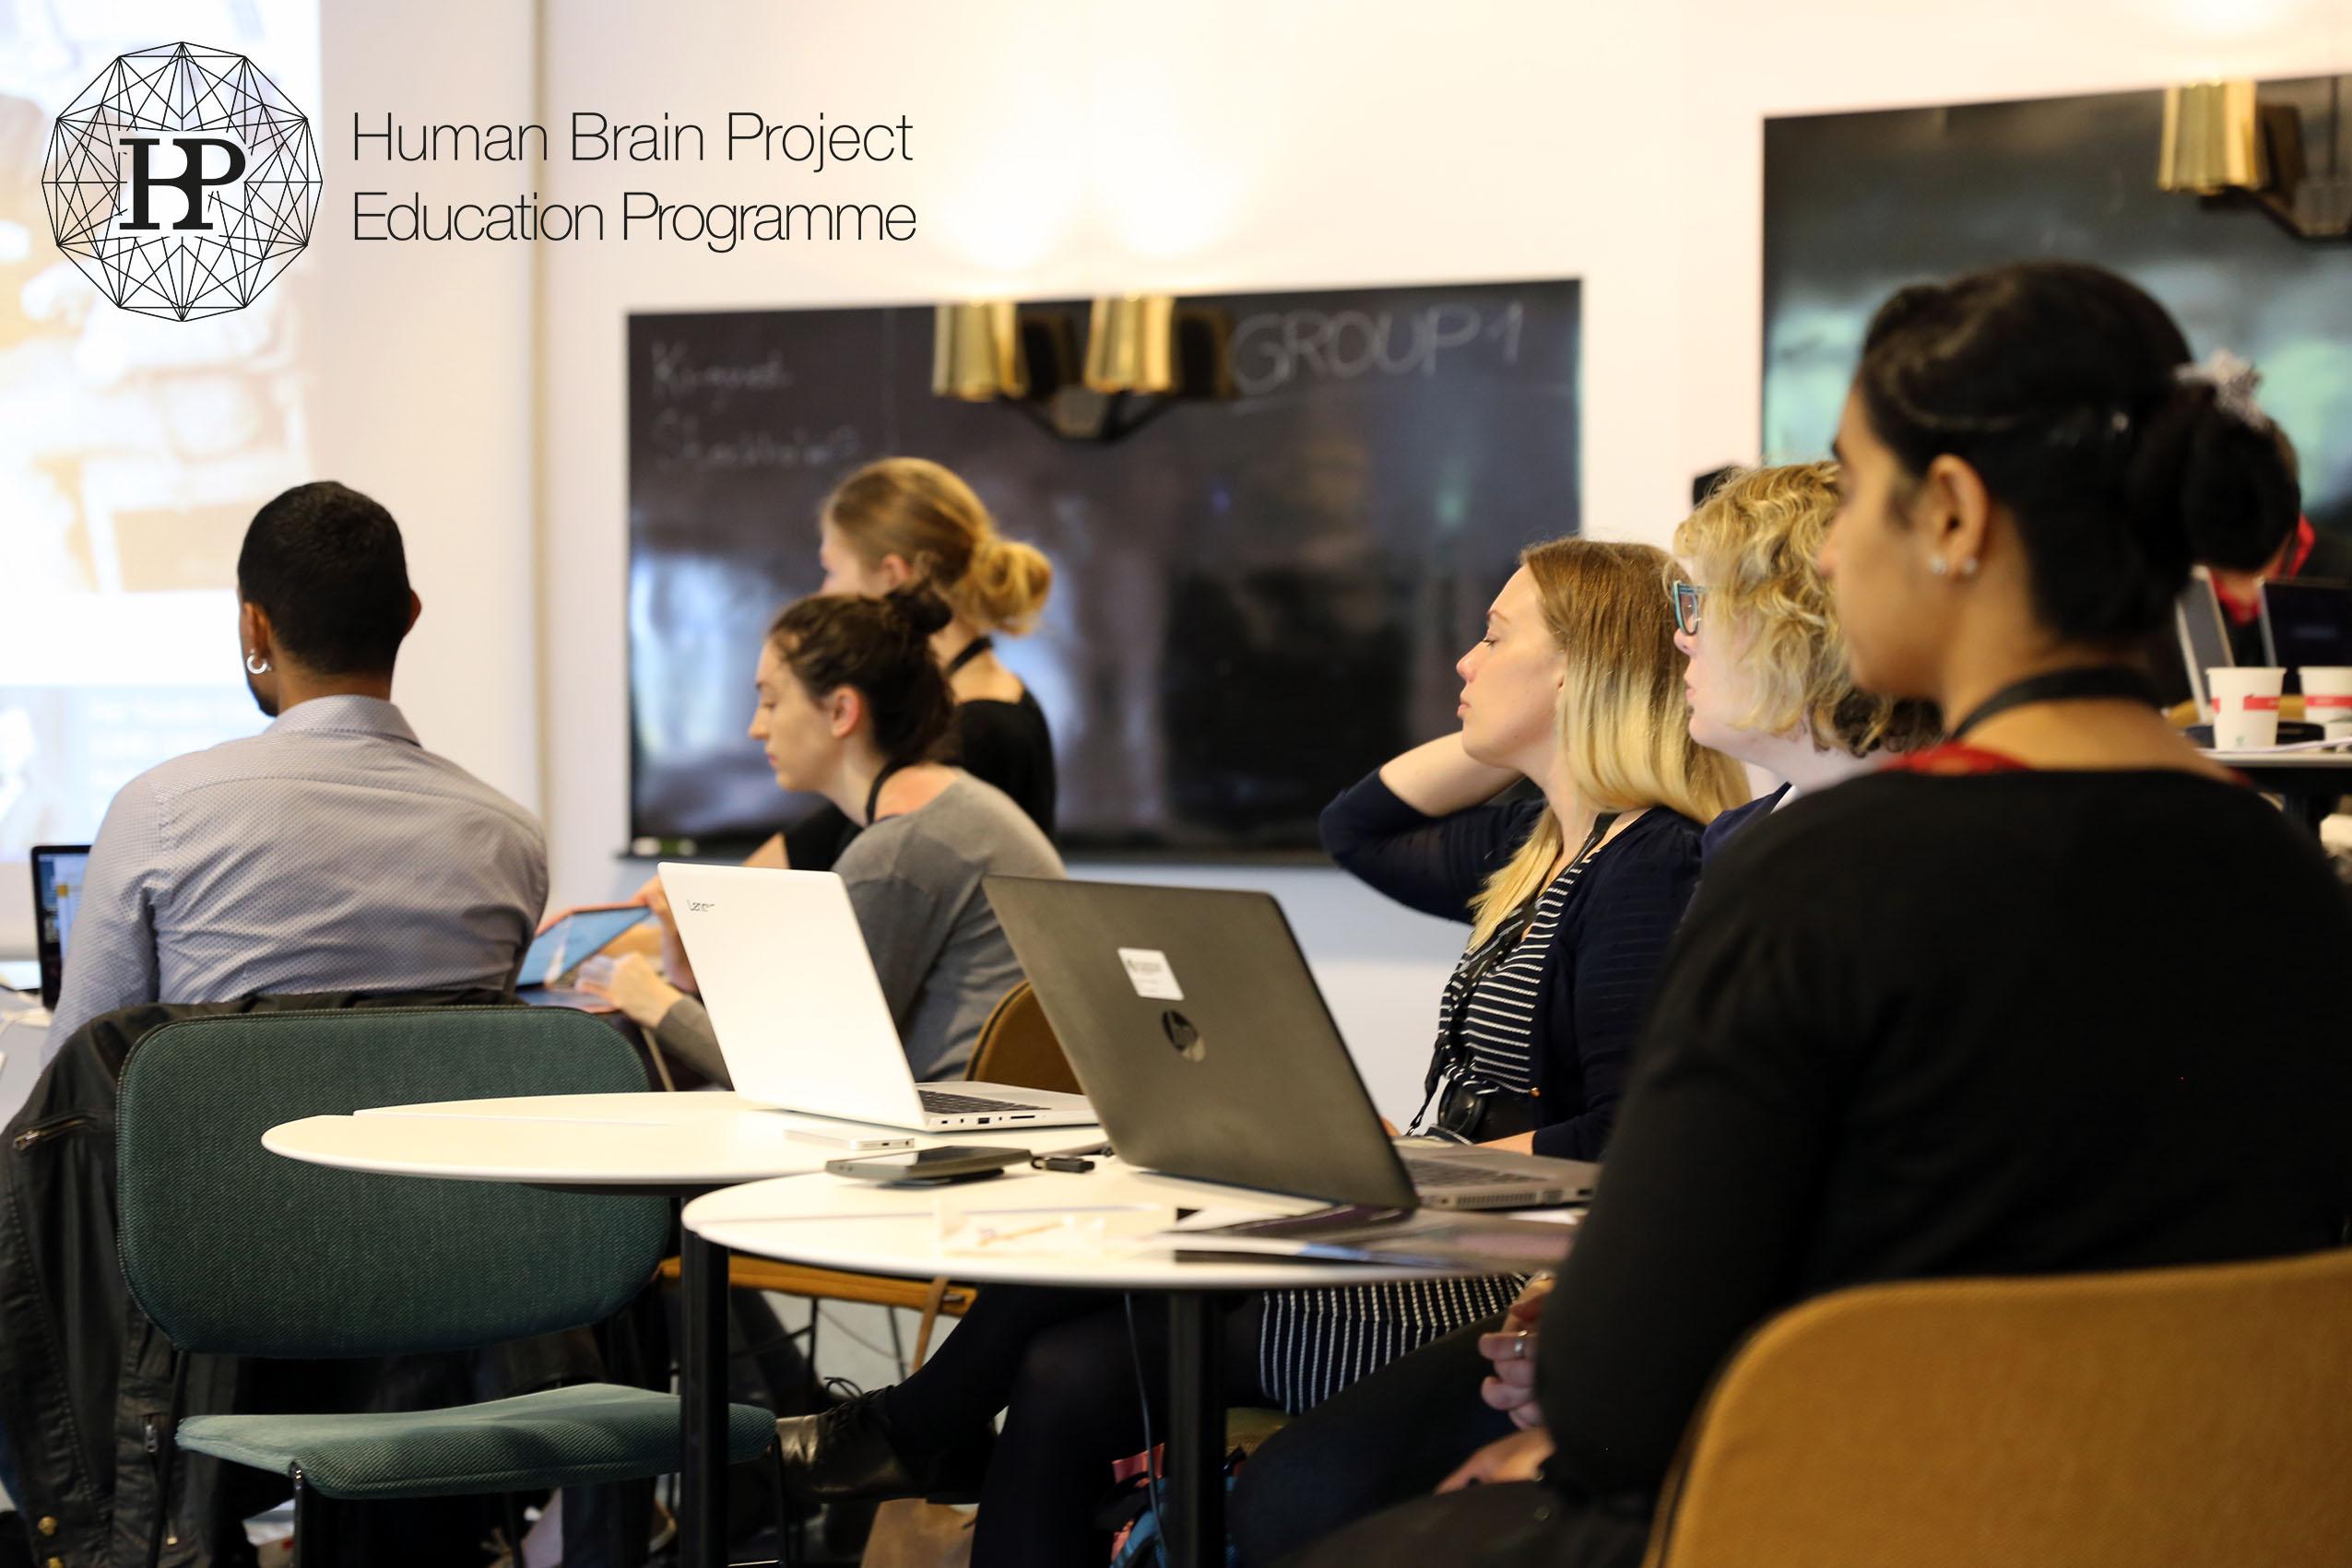 HBP_1st_Ethics_workshop_2.jpg -